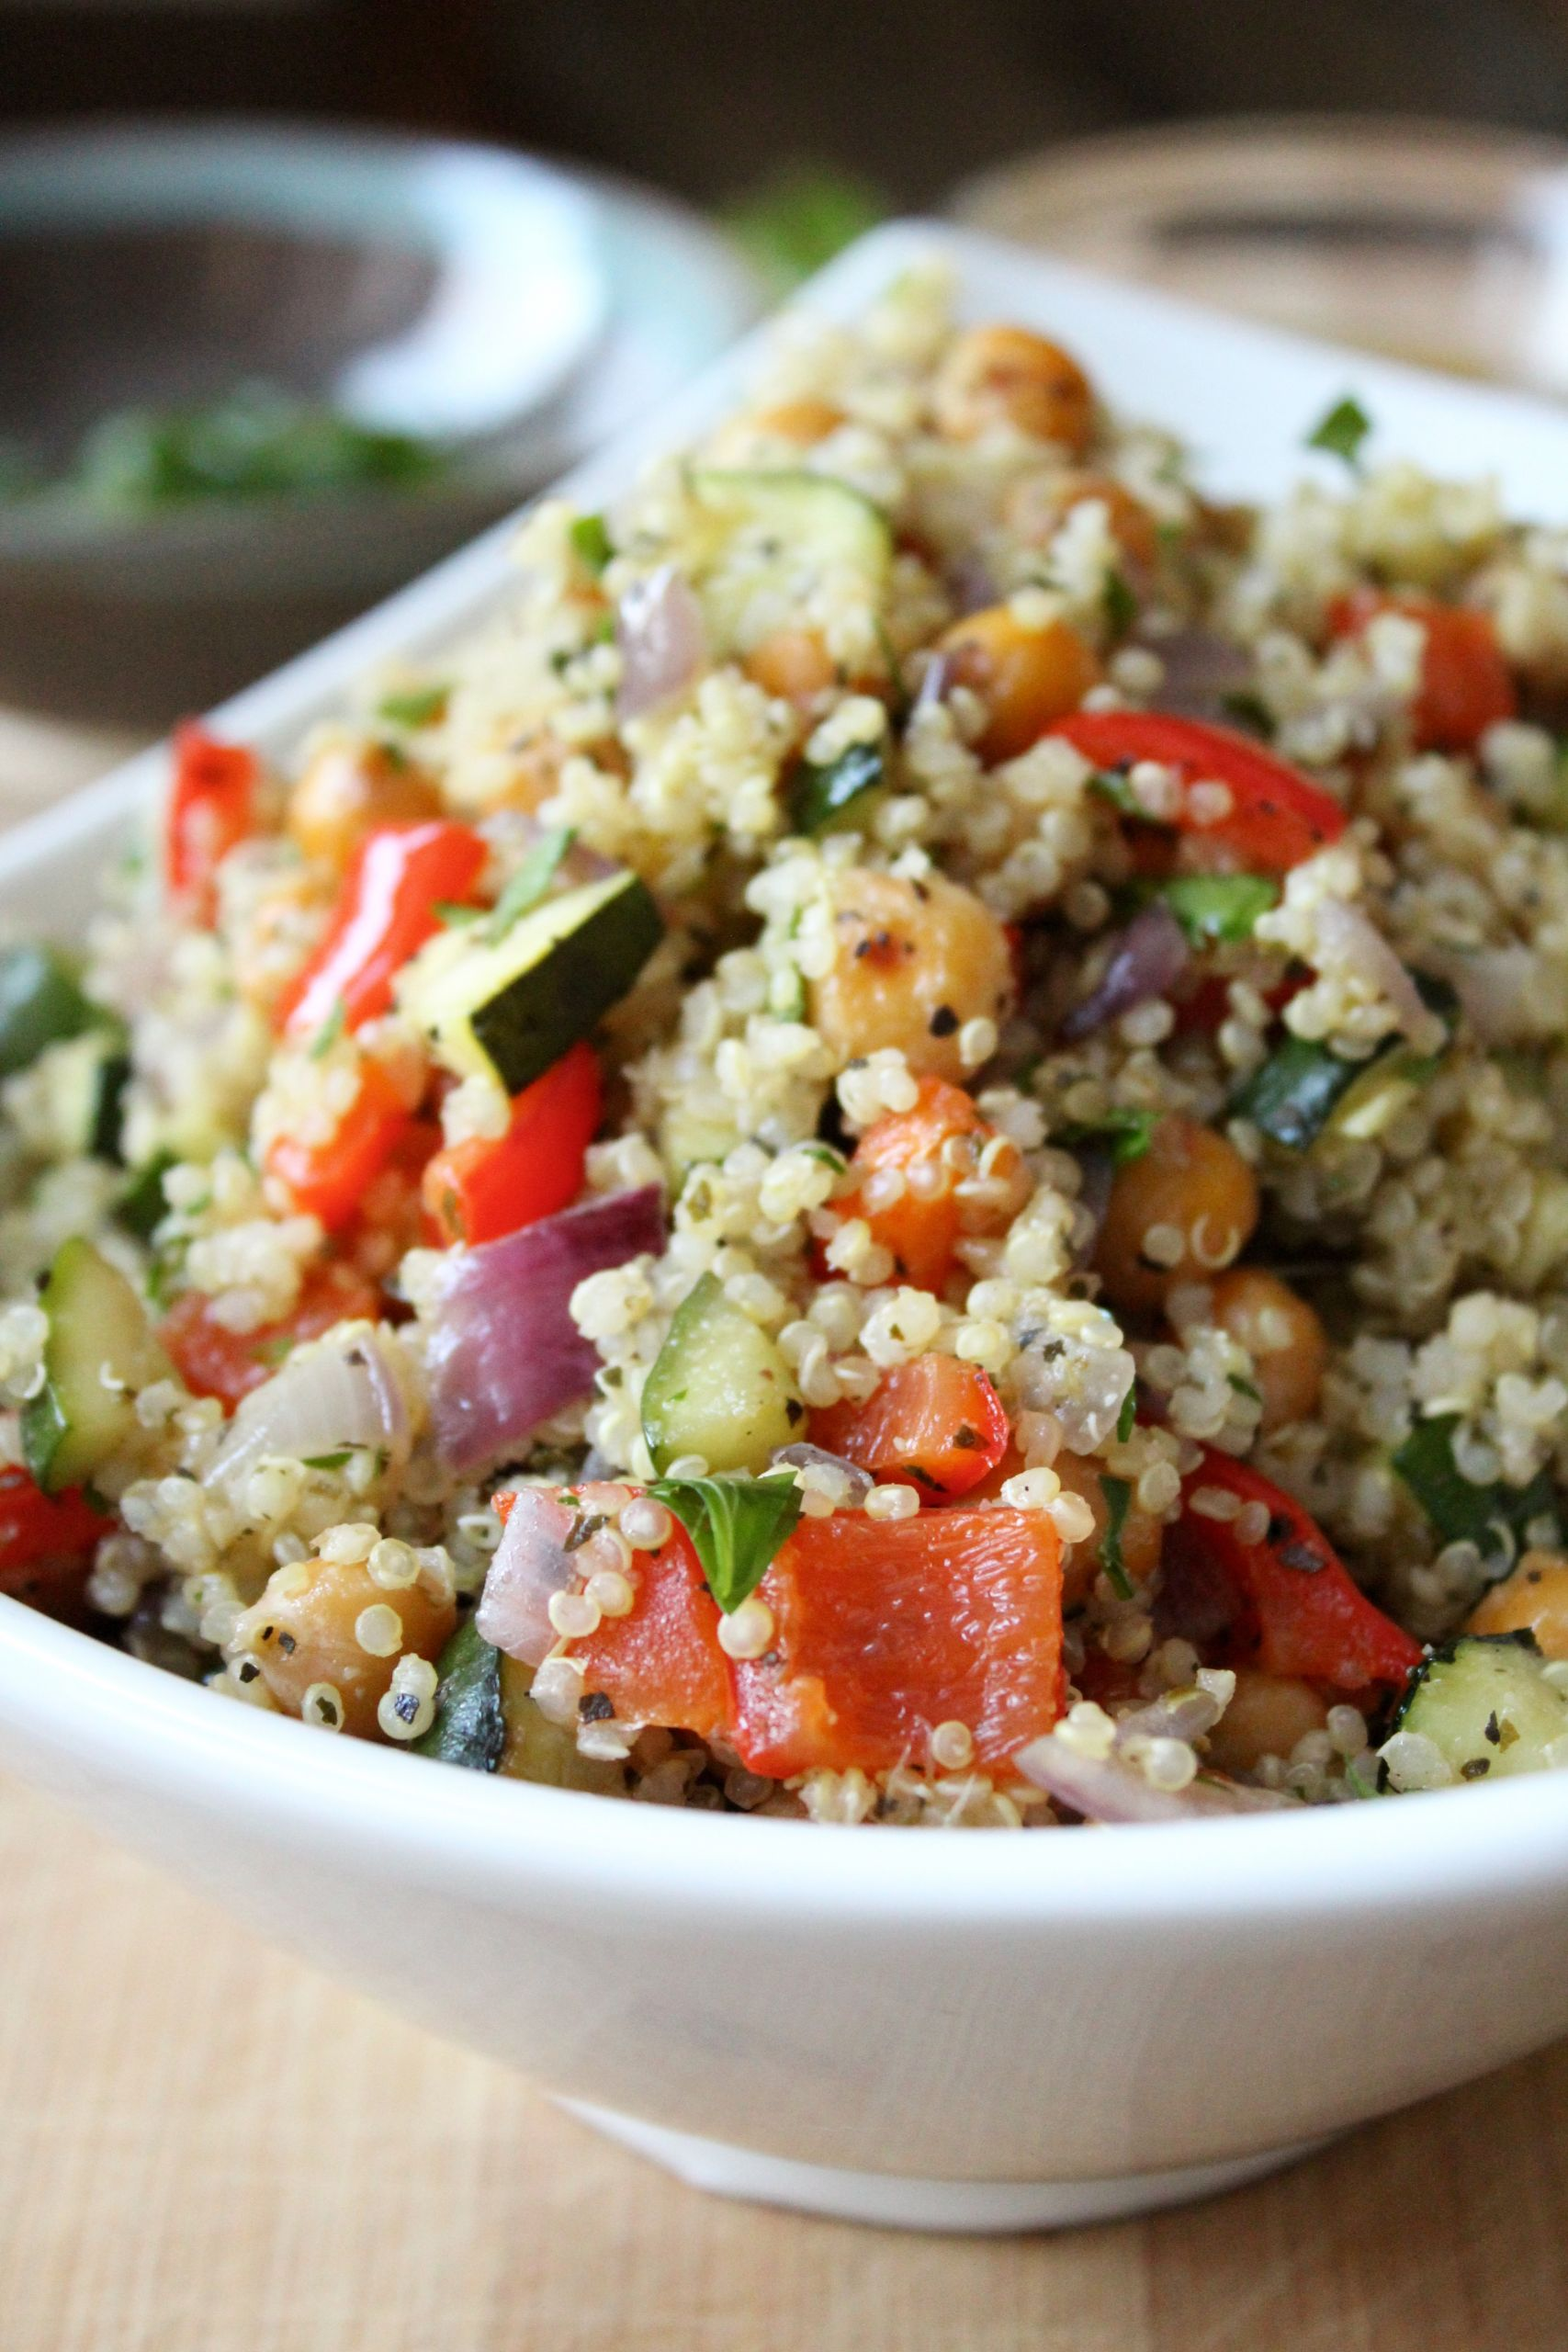 Roasted Vegetable Quinoa Salad  Roasted Ve able Quinoa Salad Insightful Bite